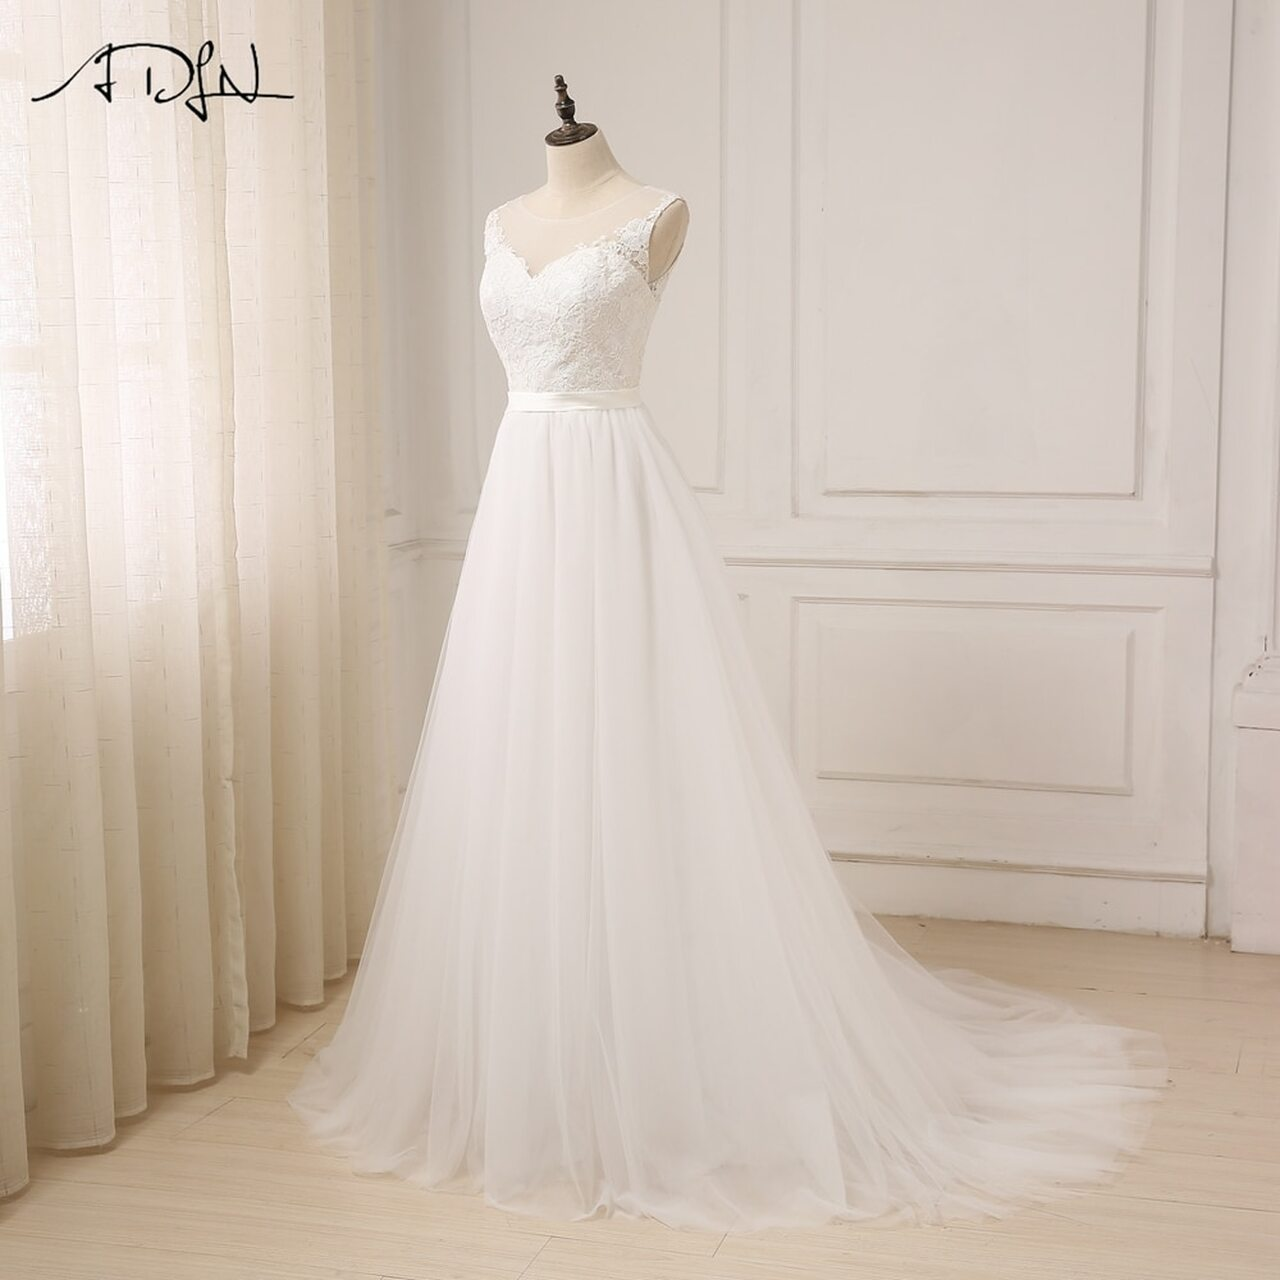 05999a72e98e ... ADLN Cheap Lace Wedding Dress O-Neck Tulle Boho Beach Bridal Gown  Bohemian Wedding Gowns ...